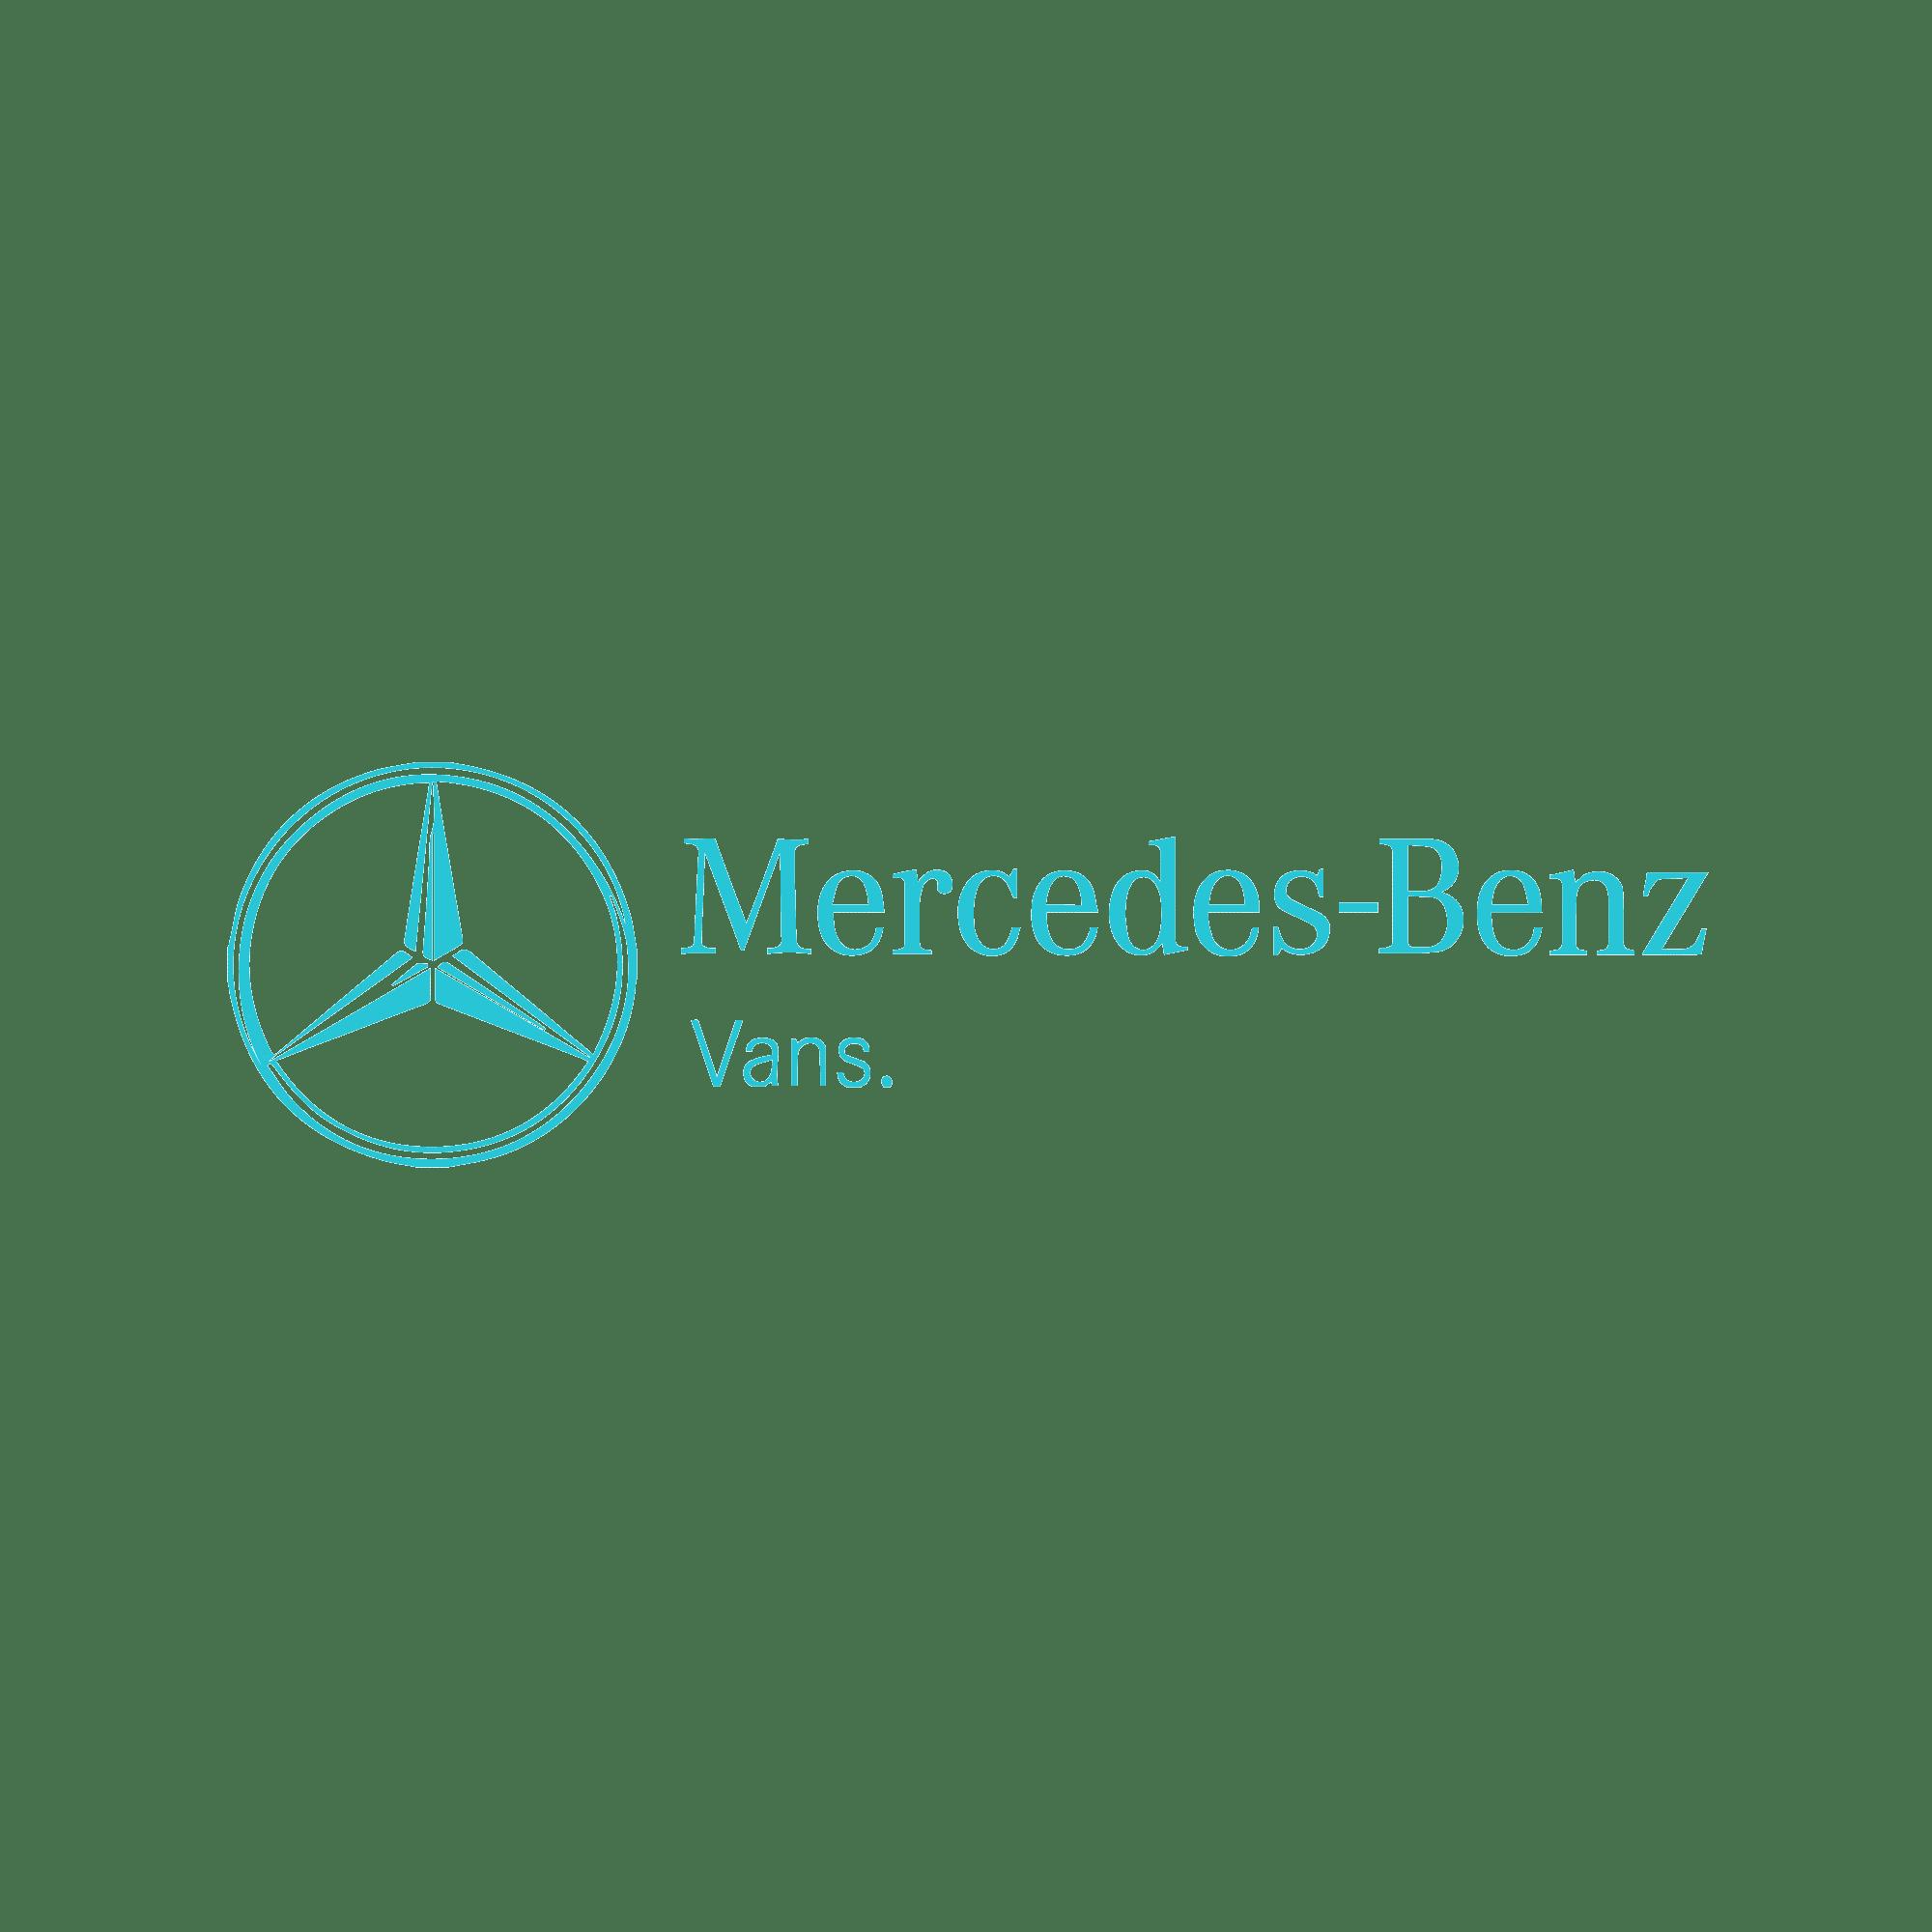 16zu9 mercedes-Benz vans kundenlogo türkis